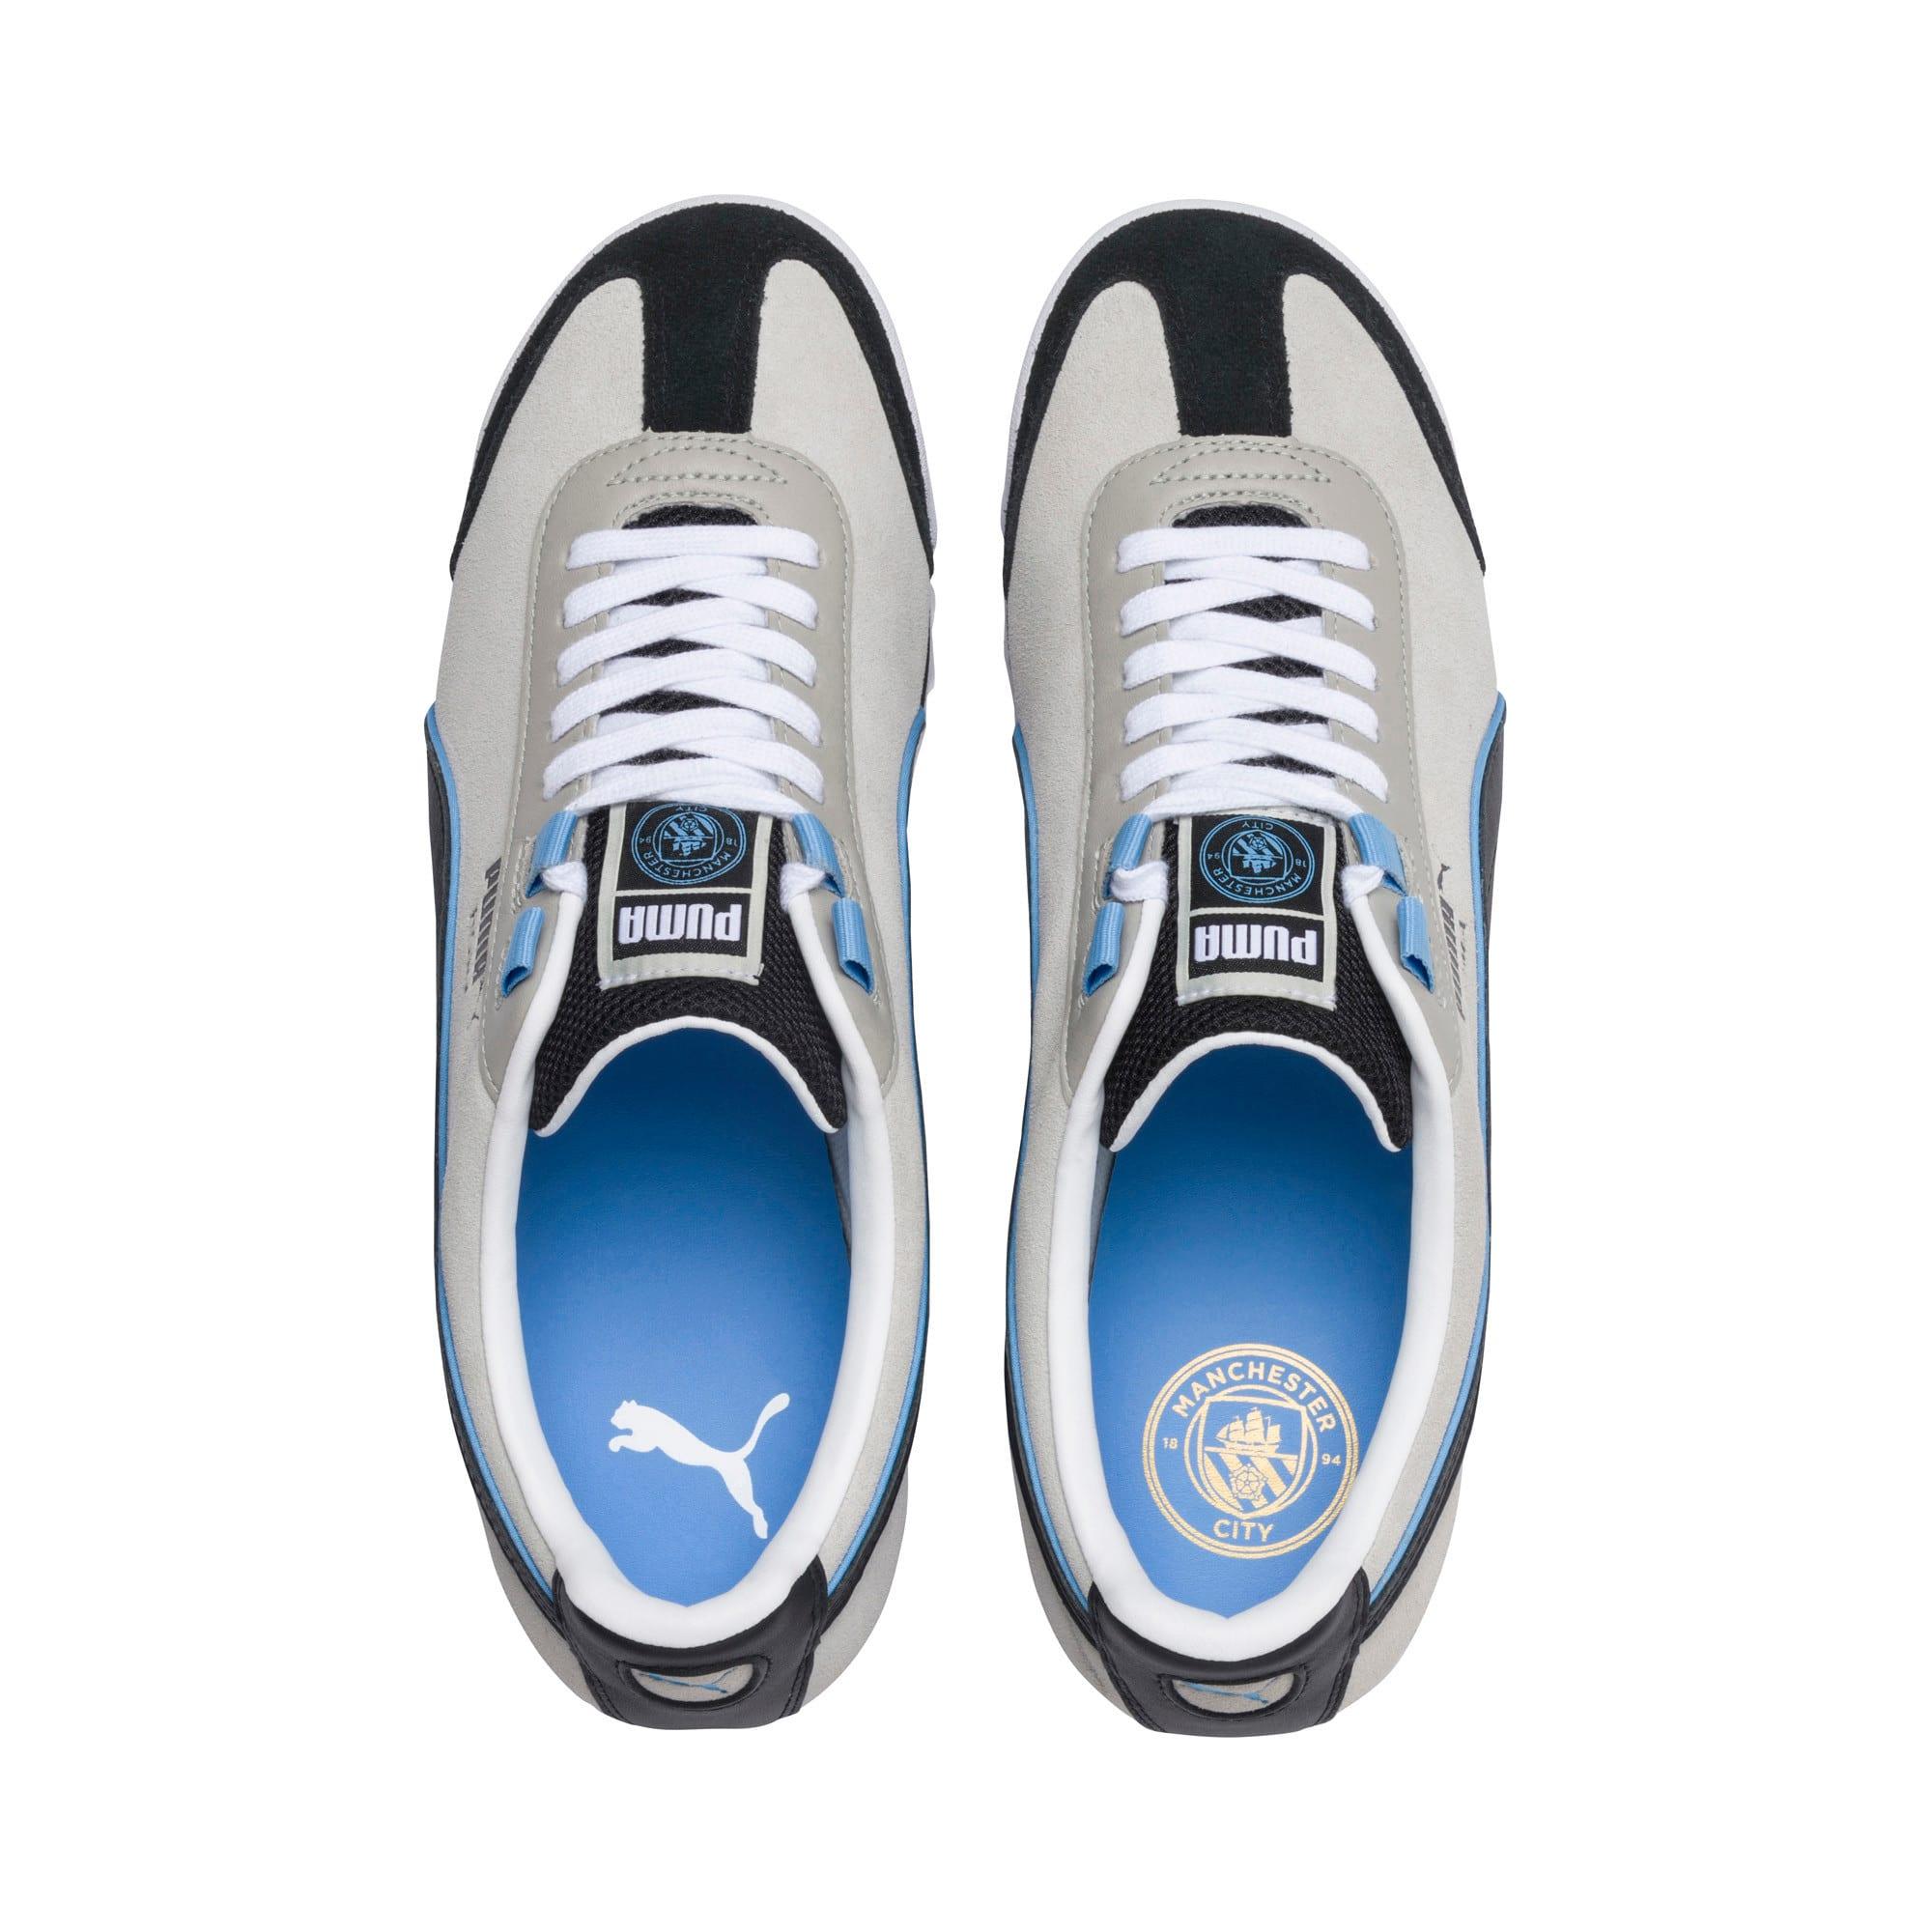 Thumbnail 6 of Roma Manchester City Men's Sneakers, Gray Violet-Team Light Blue, medium